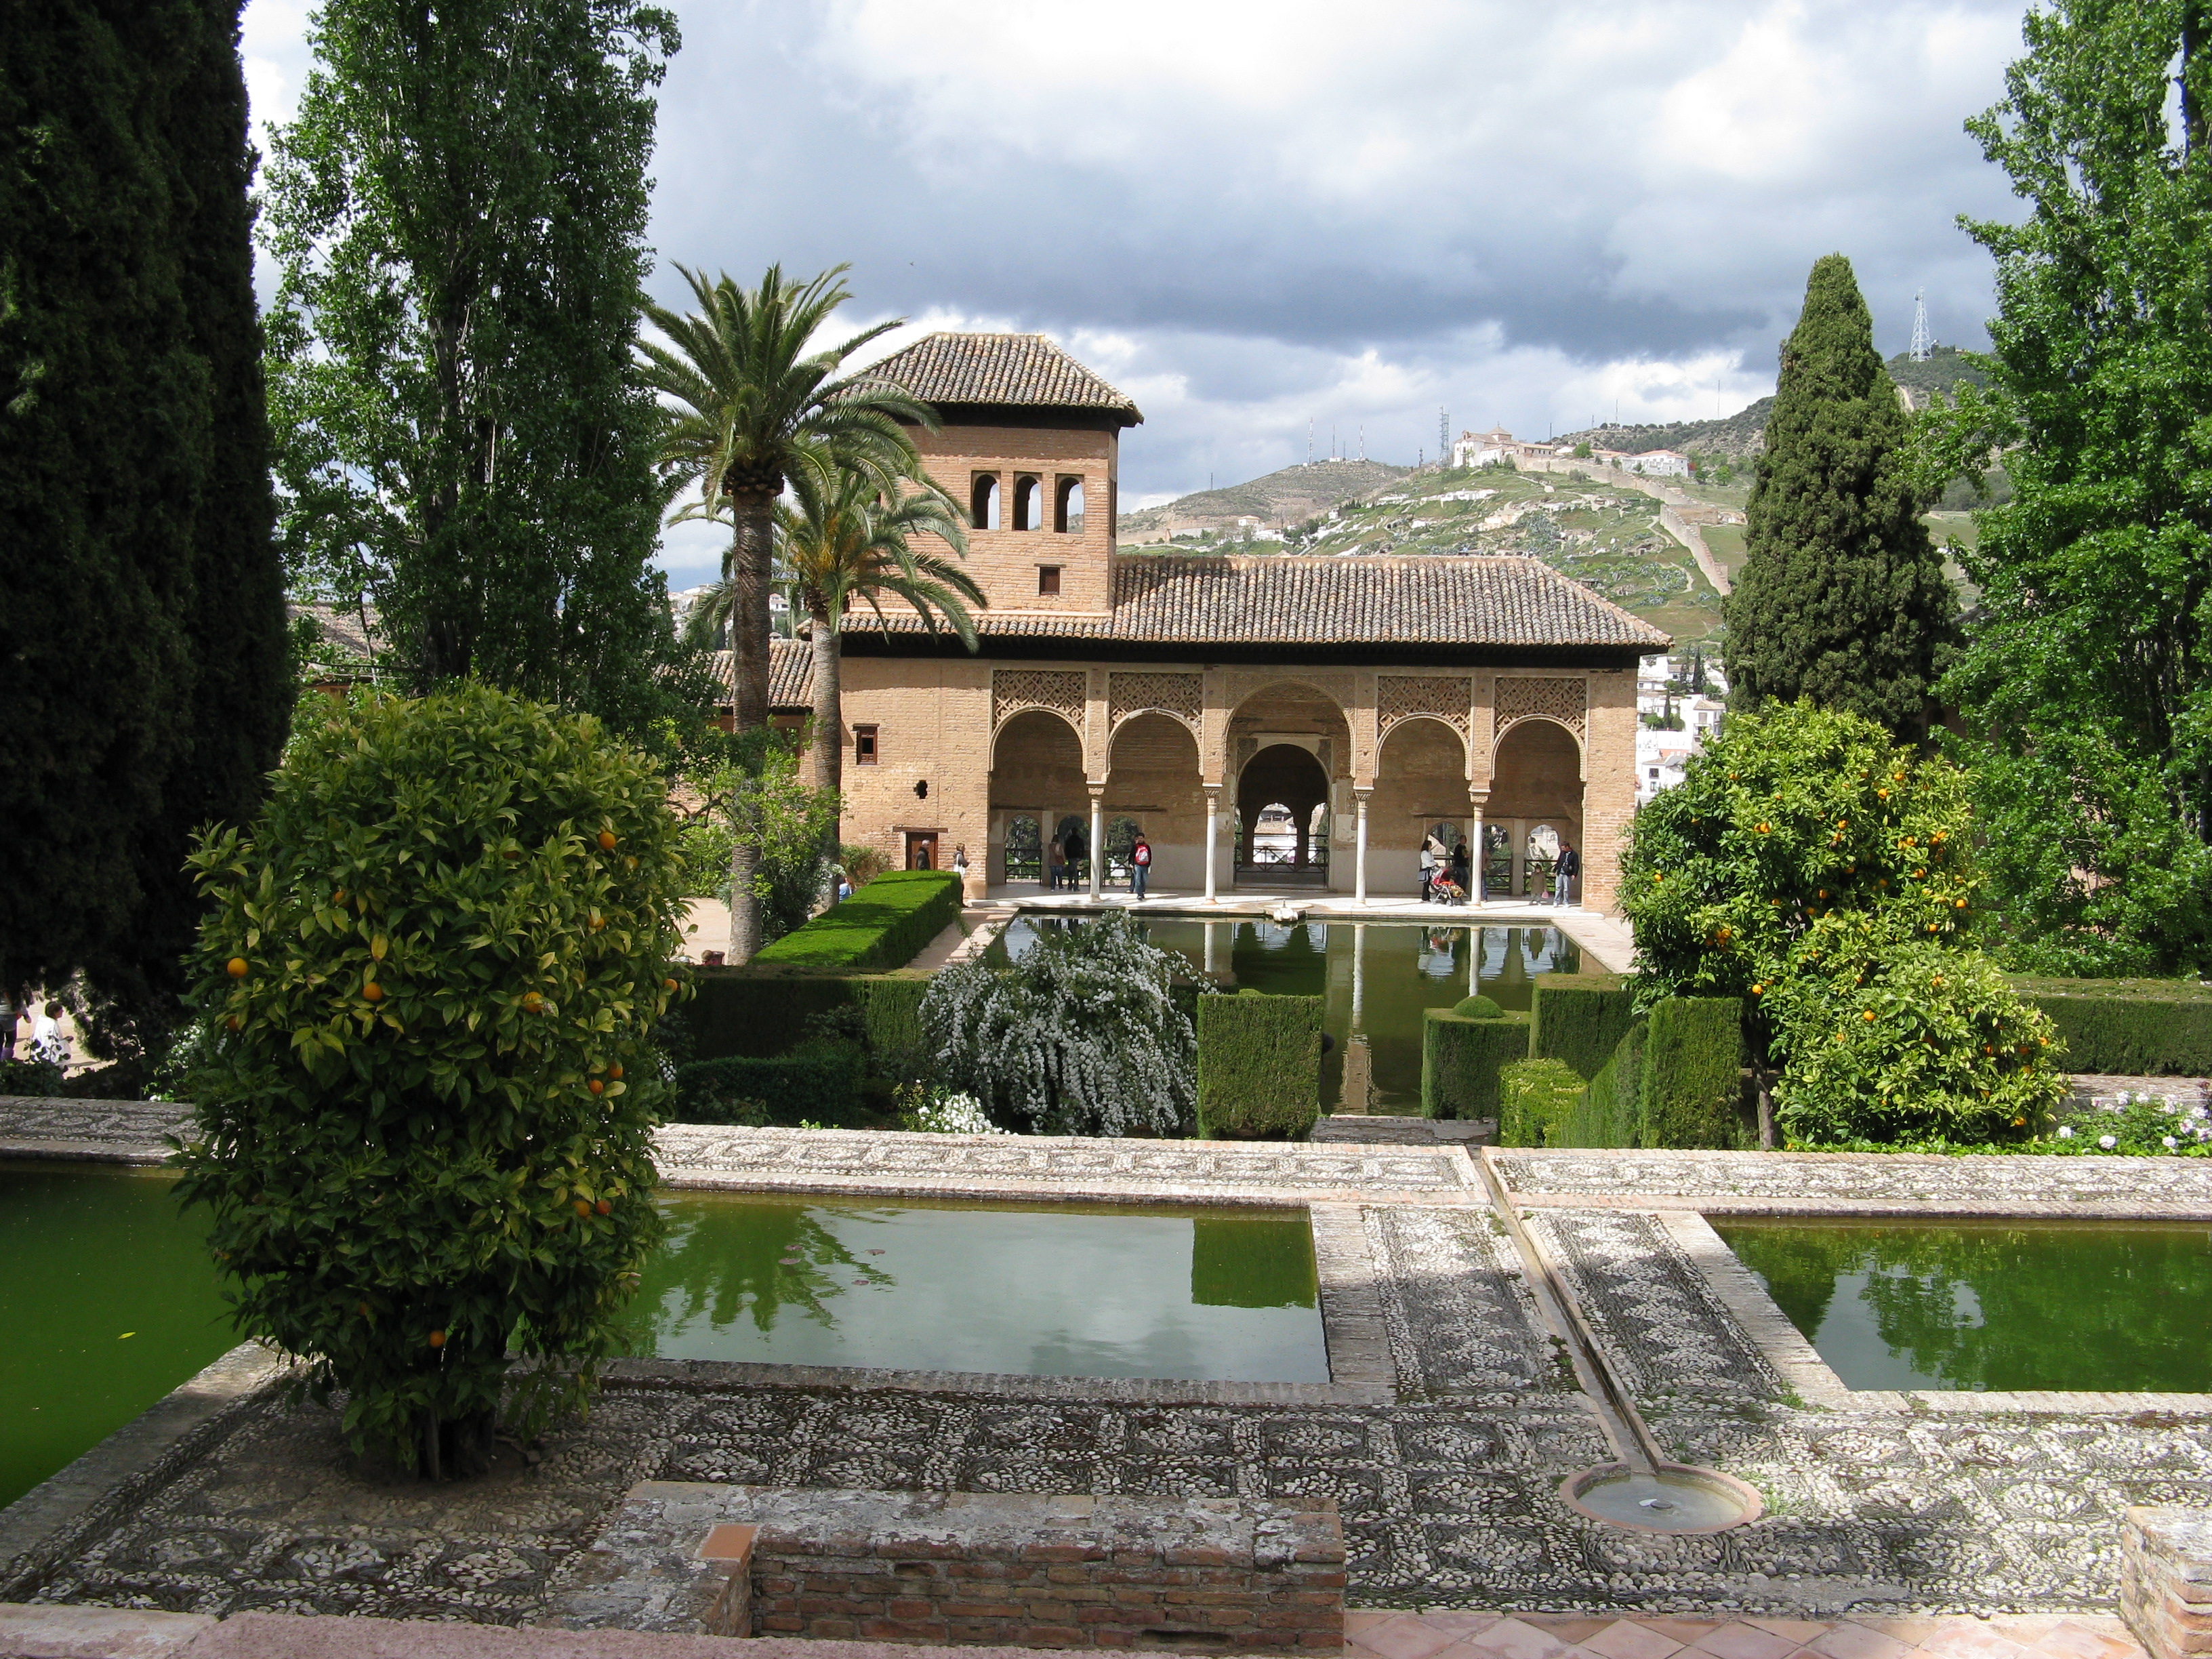 File:Alhambra-Granada.jpg - Wikimedia Commons